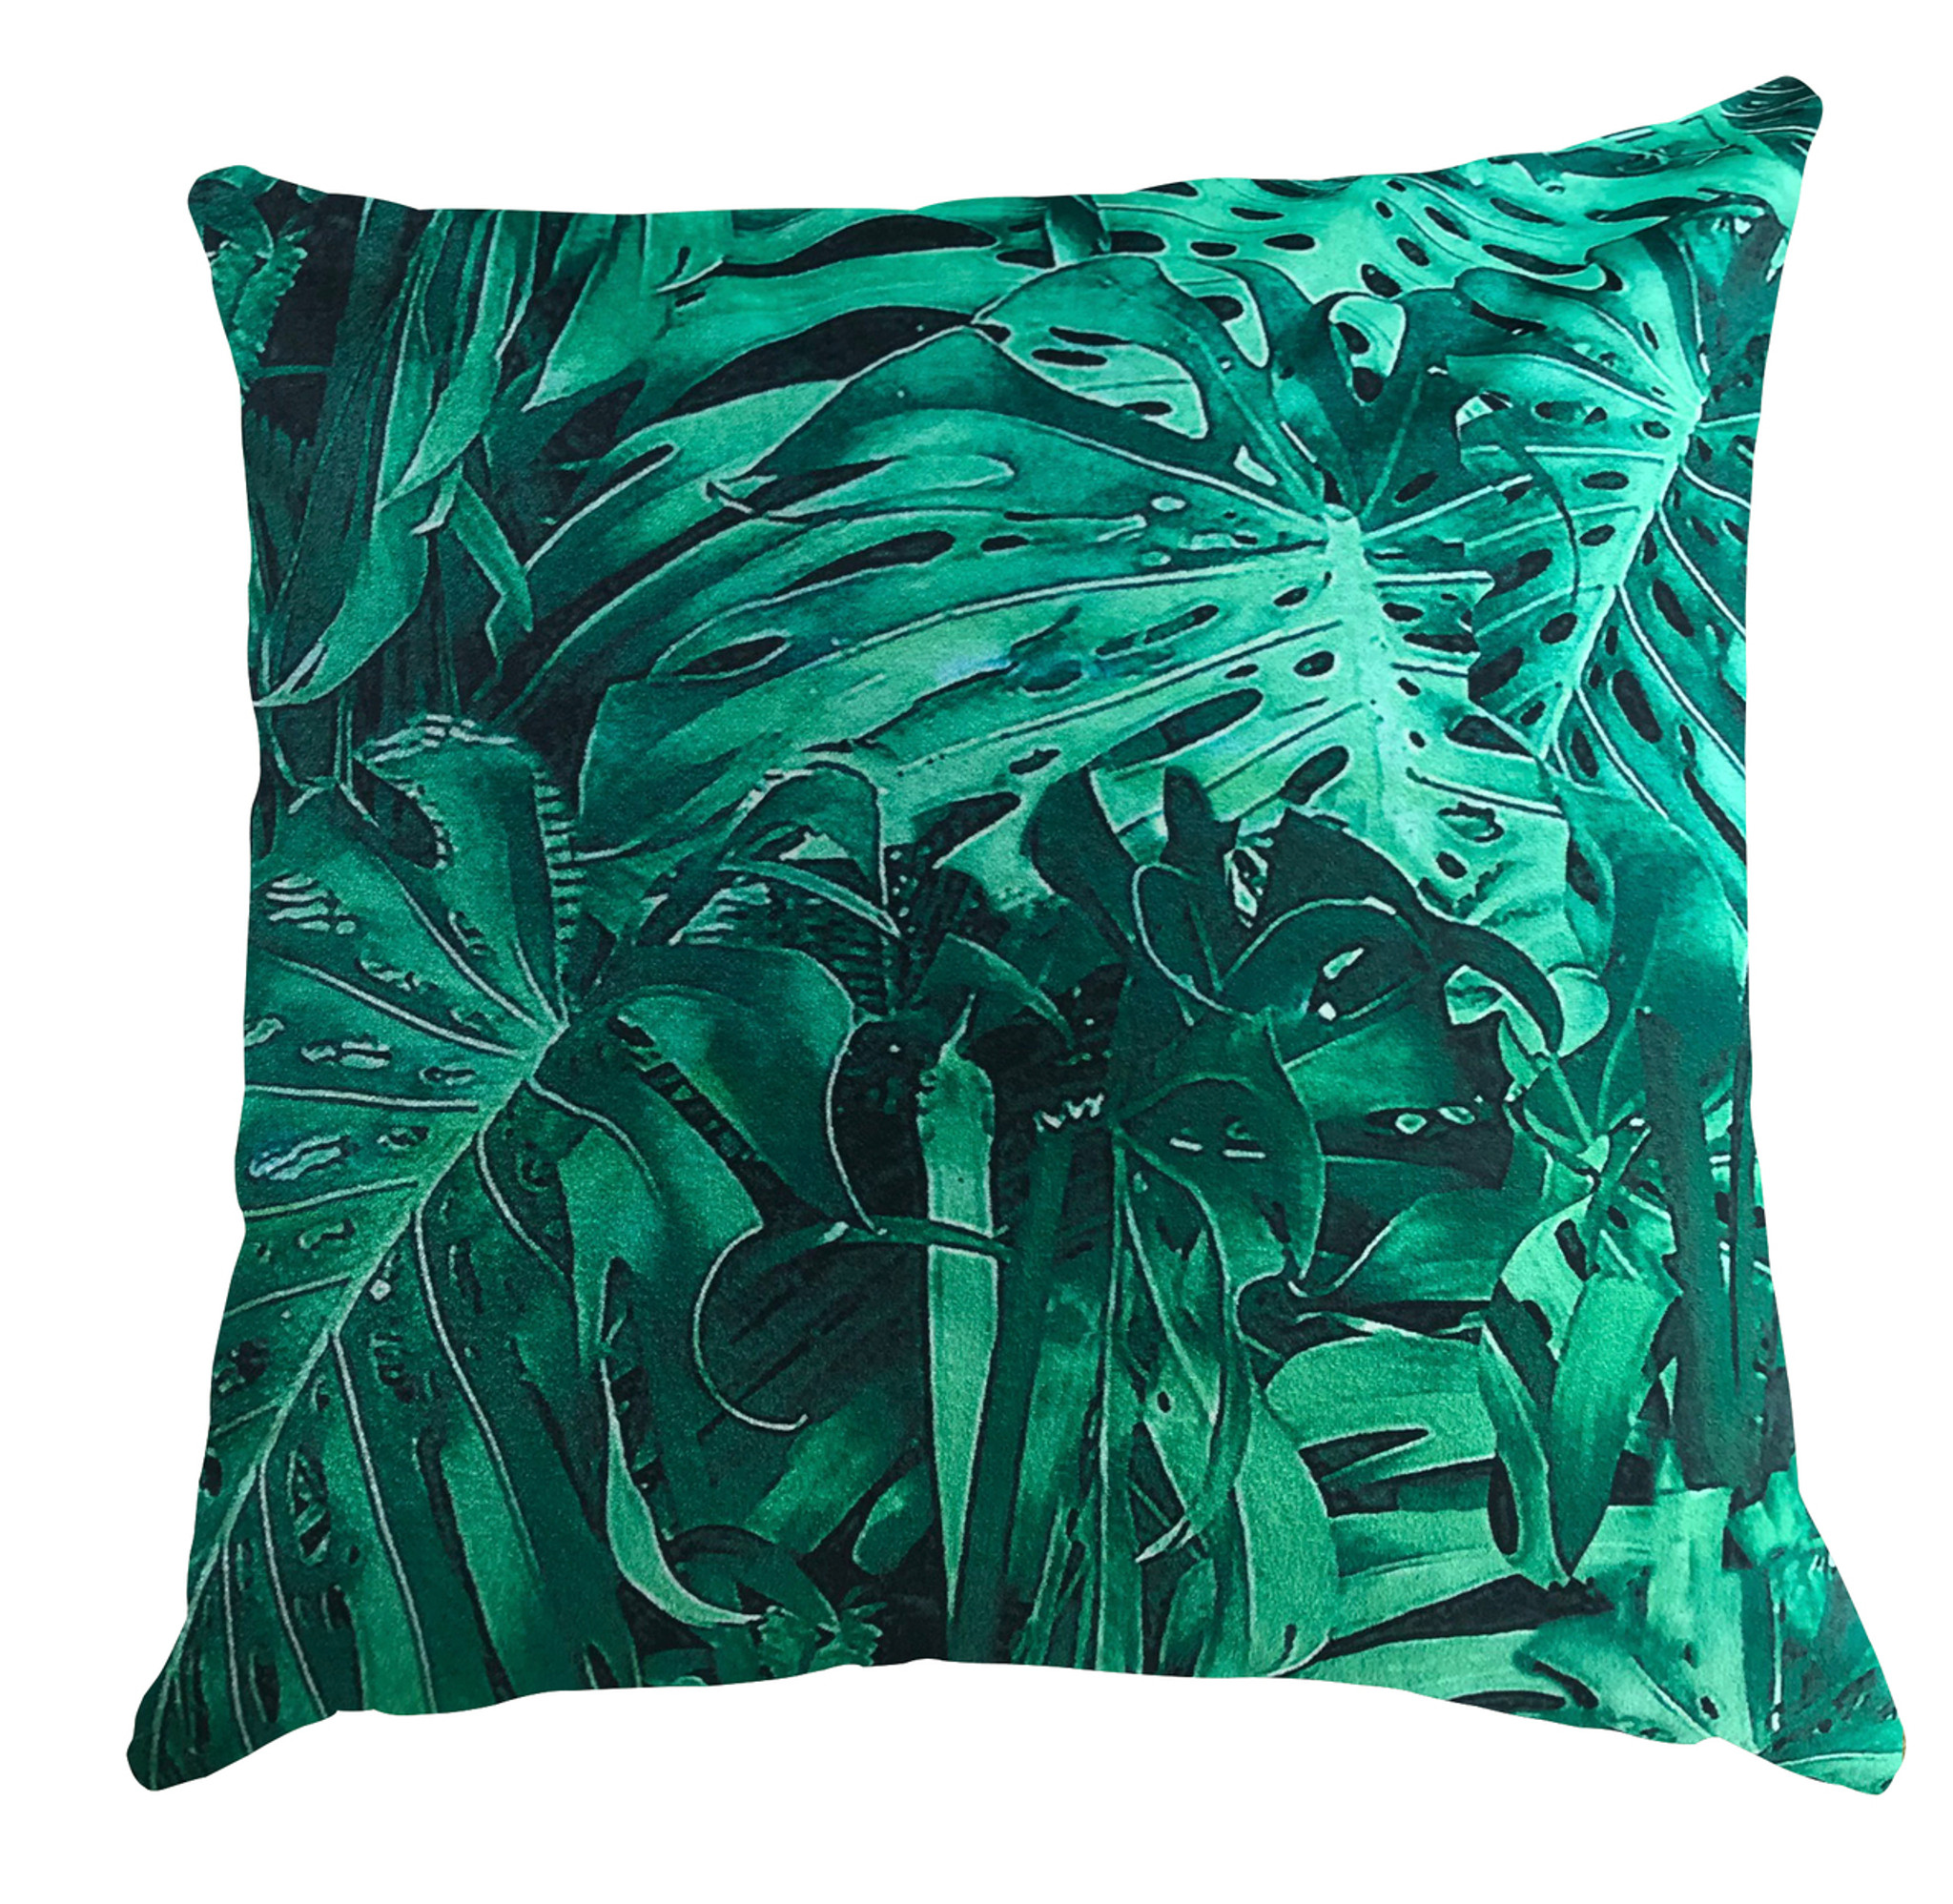 Cushion Cover - Jungle Vibe - Metallica Green